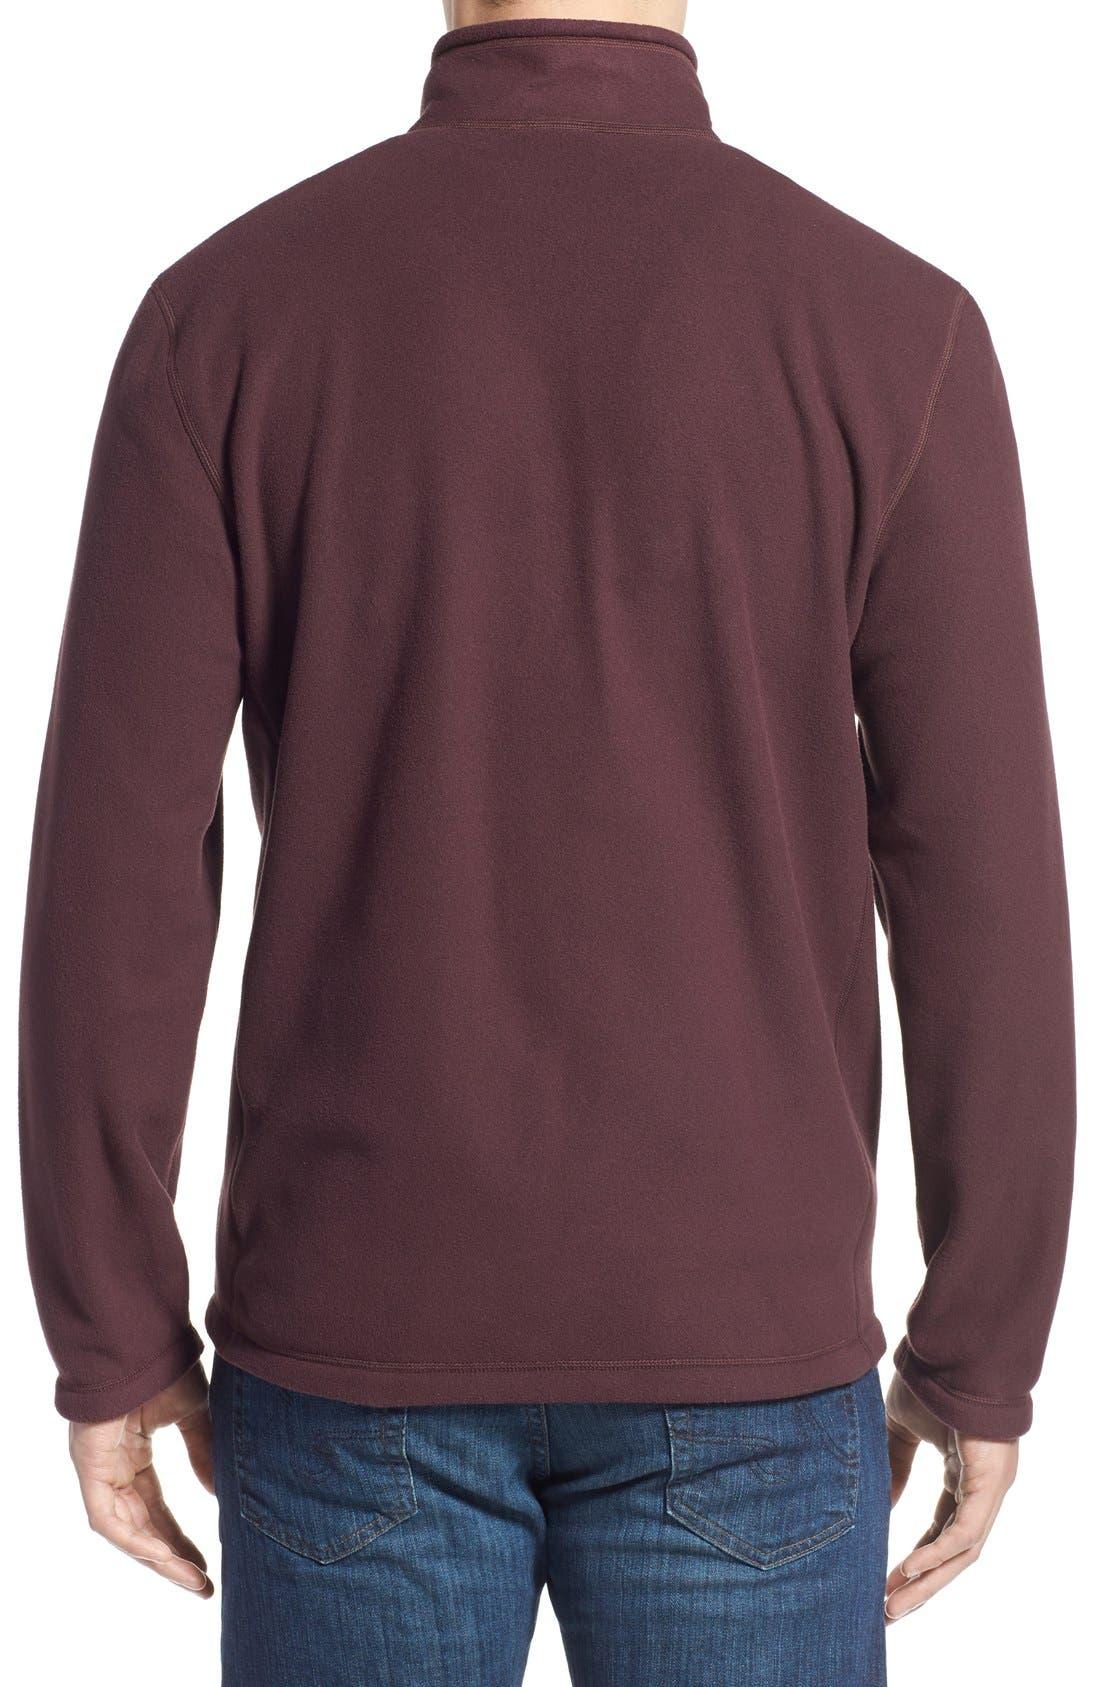 'TKA 100 Glacier' Quarter Zip Fleece Pullover,                             Alternate thumbnail 70, color,